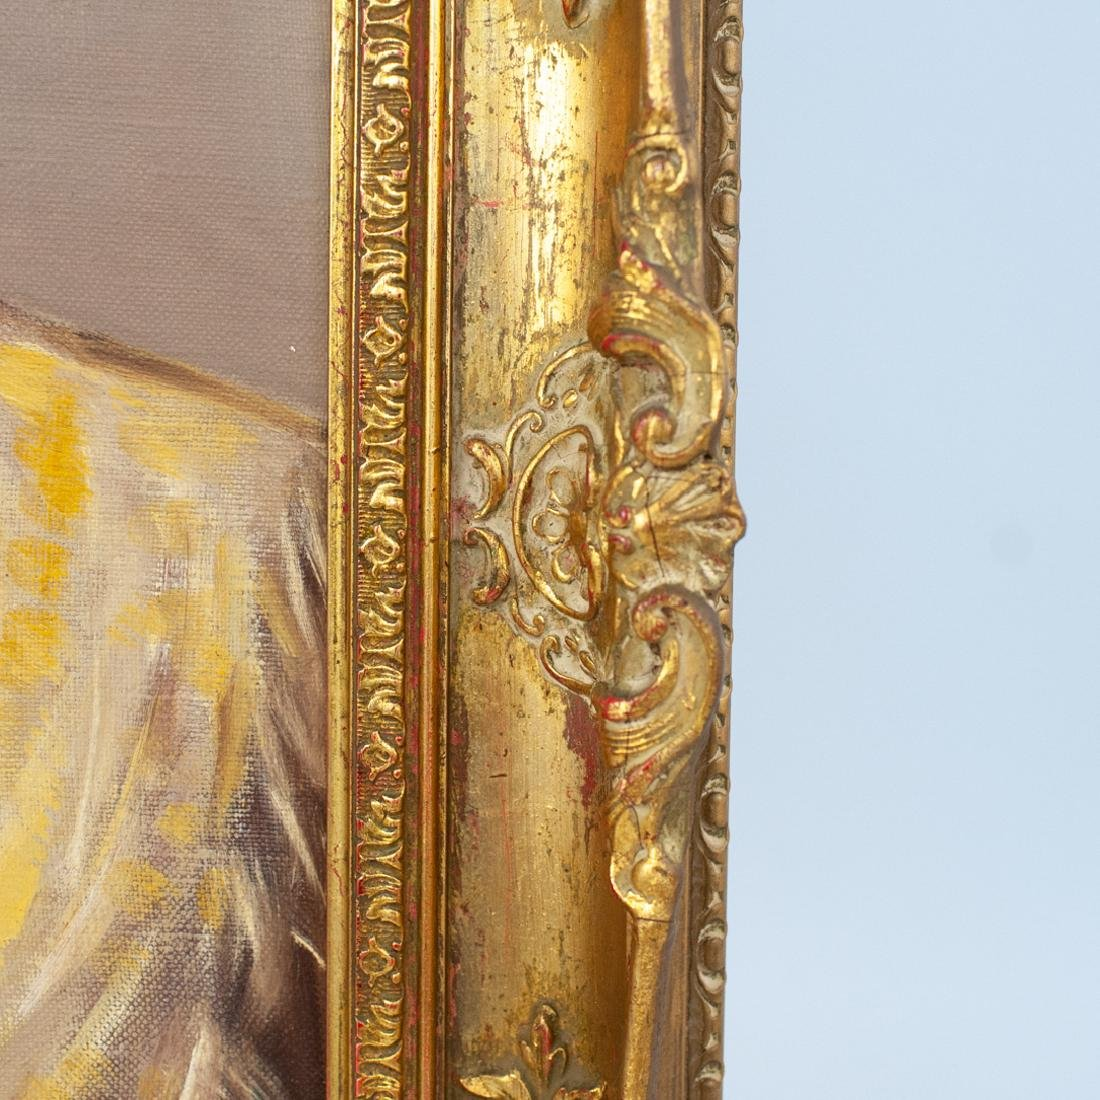 Enrico Frattini (Italian, 1890-1968) Portrait of a - 4